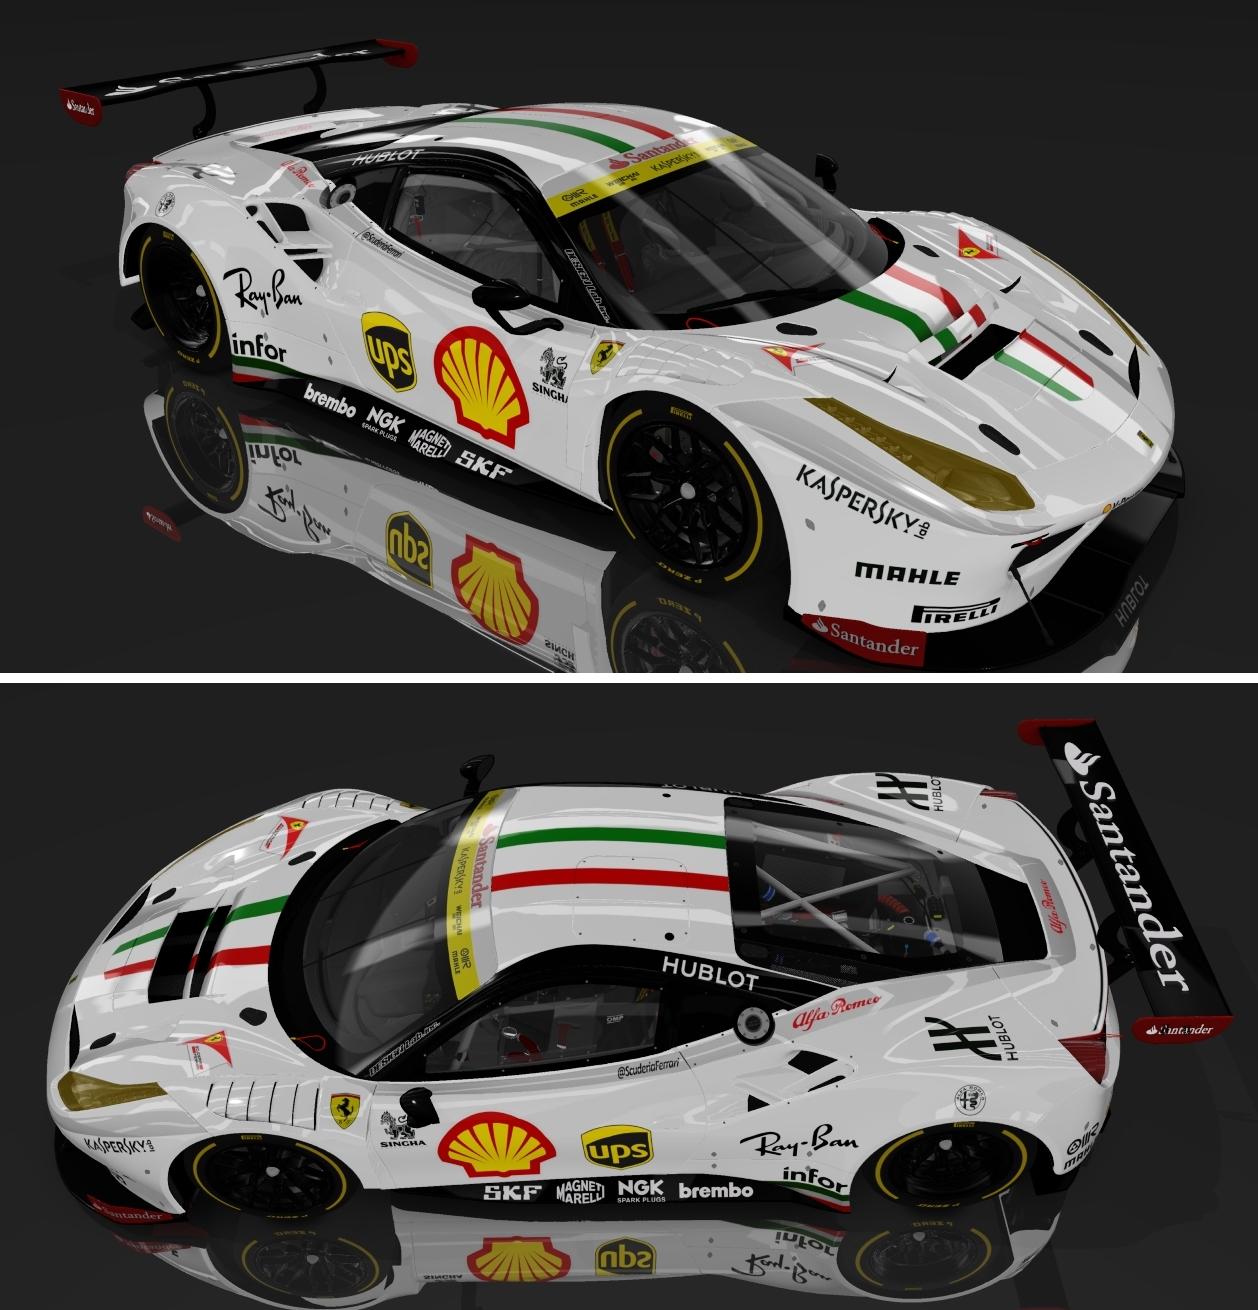 Scuderia_Ferrari.jpg